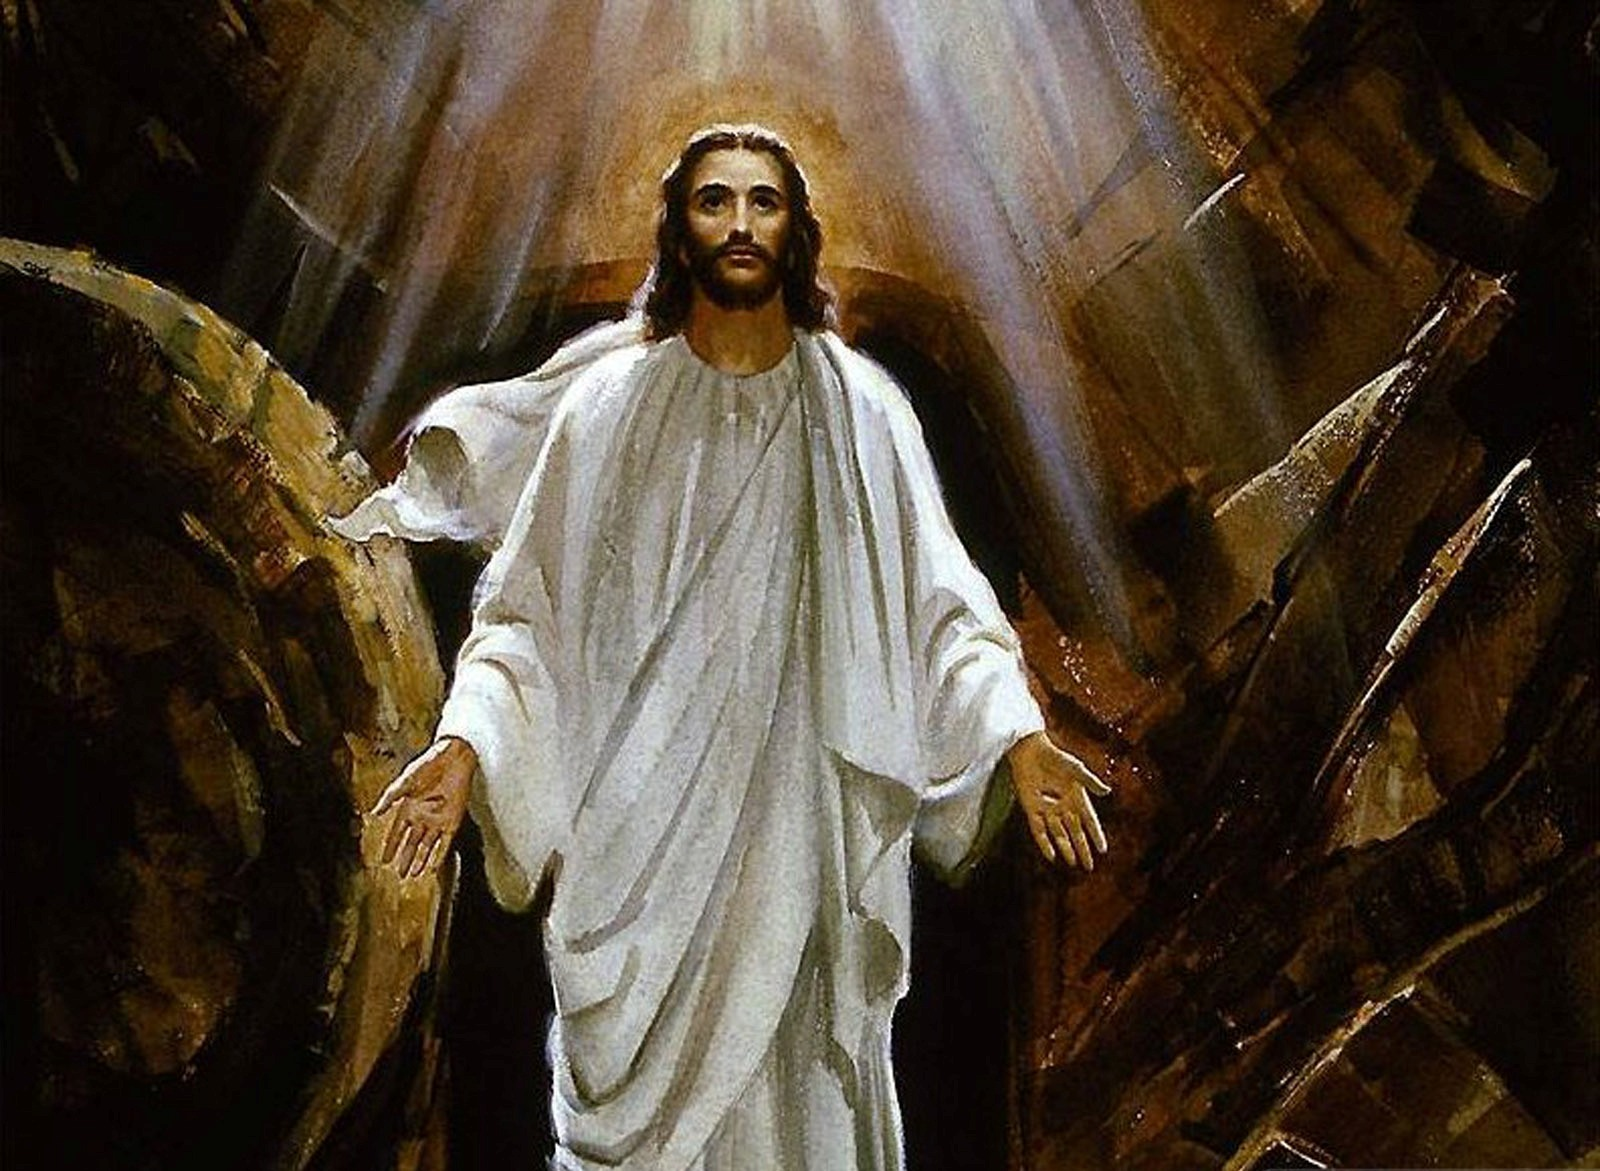 jesus christ widescreen wallpapers - photo #9